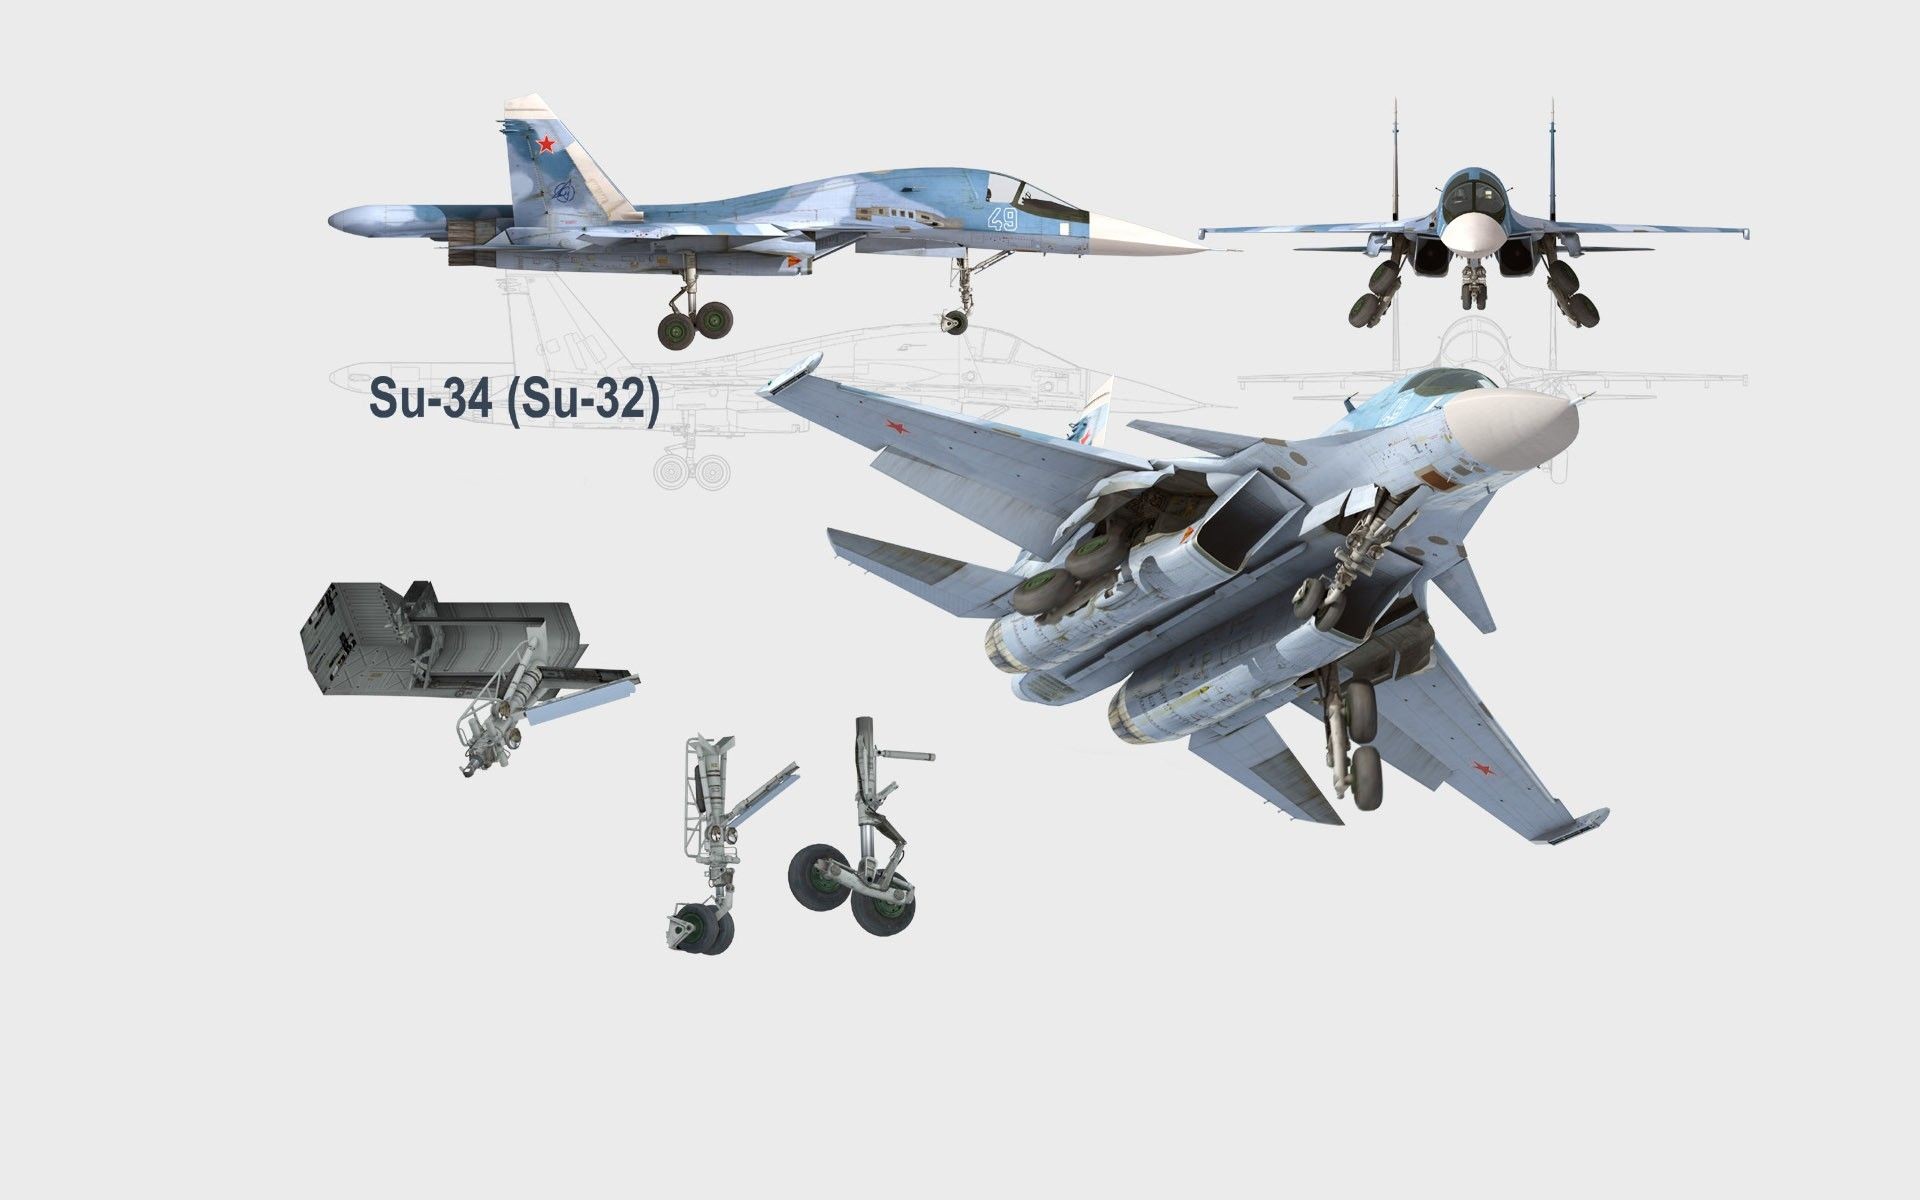 Military Sukhoi Su 34 Artistic Art Russia Russian Schematic Air Force Airplane Aircraft Wallpaper